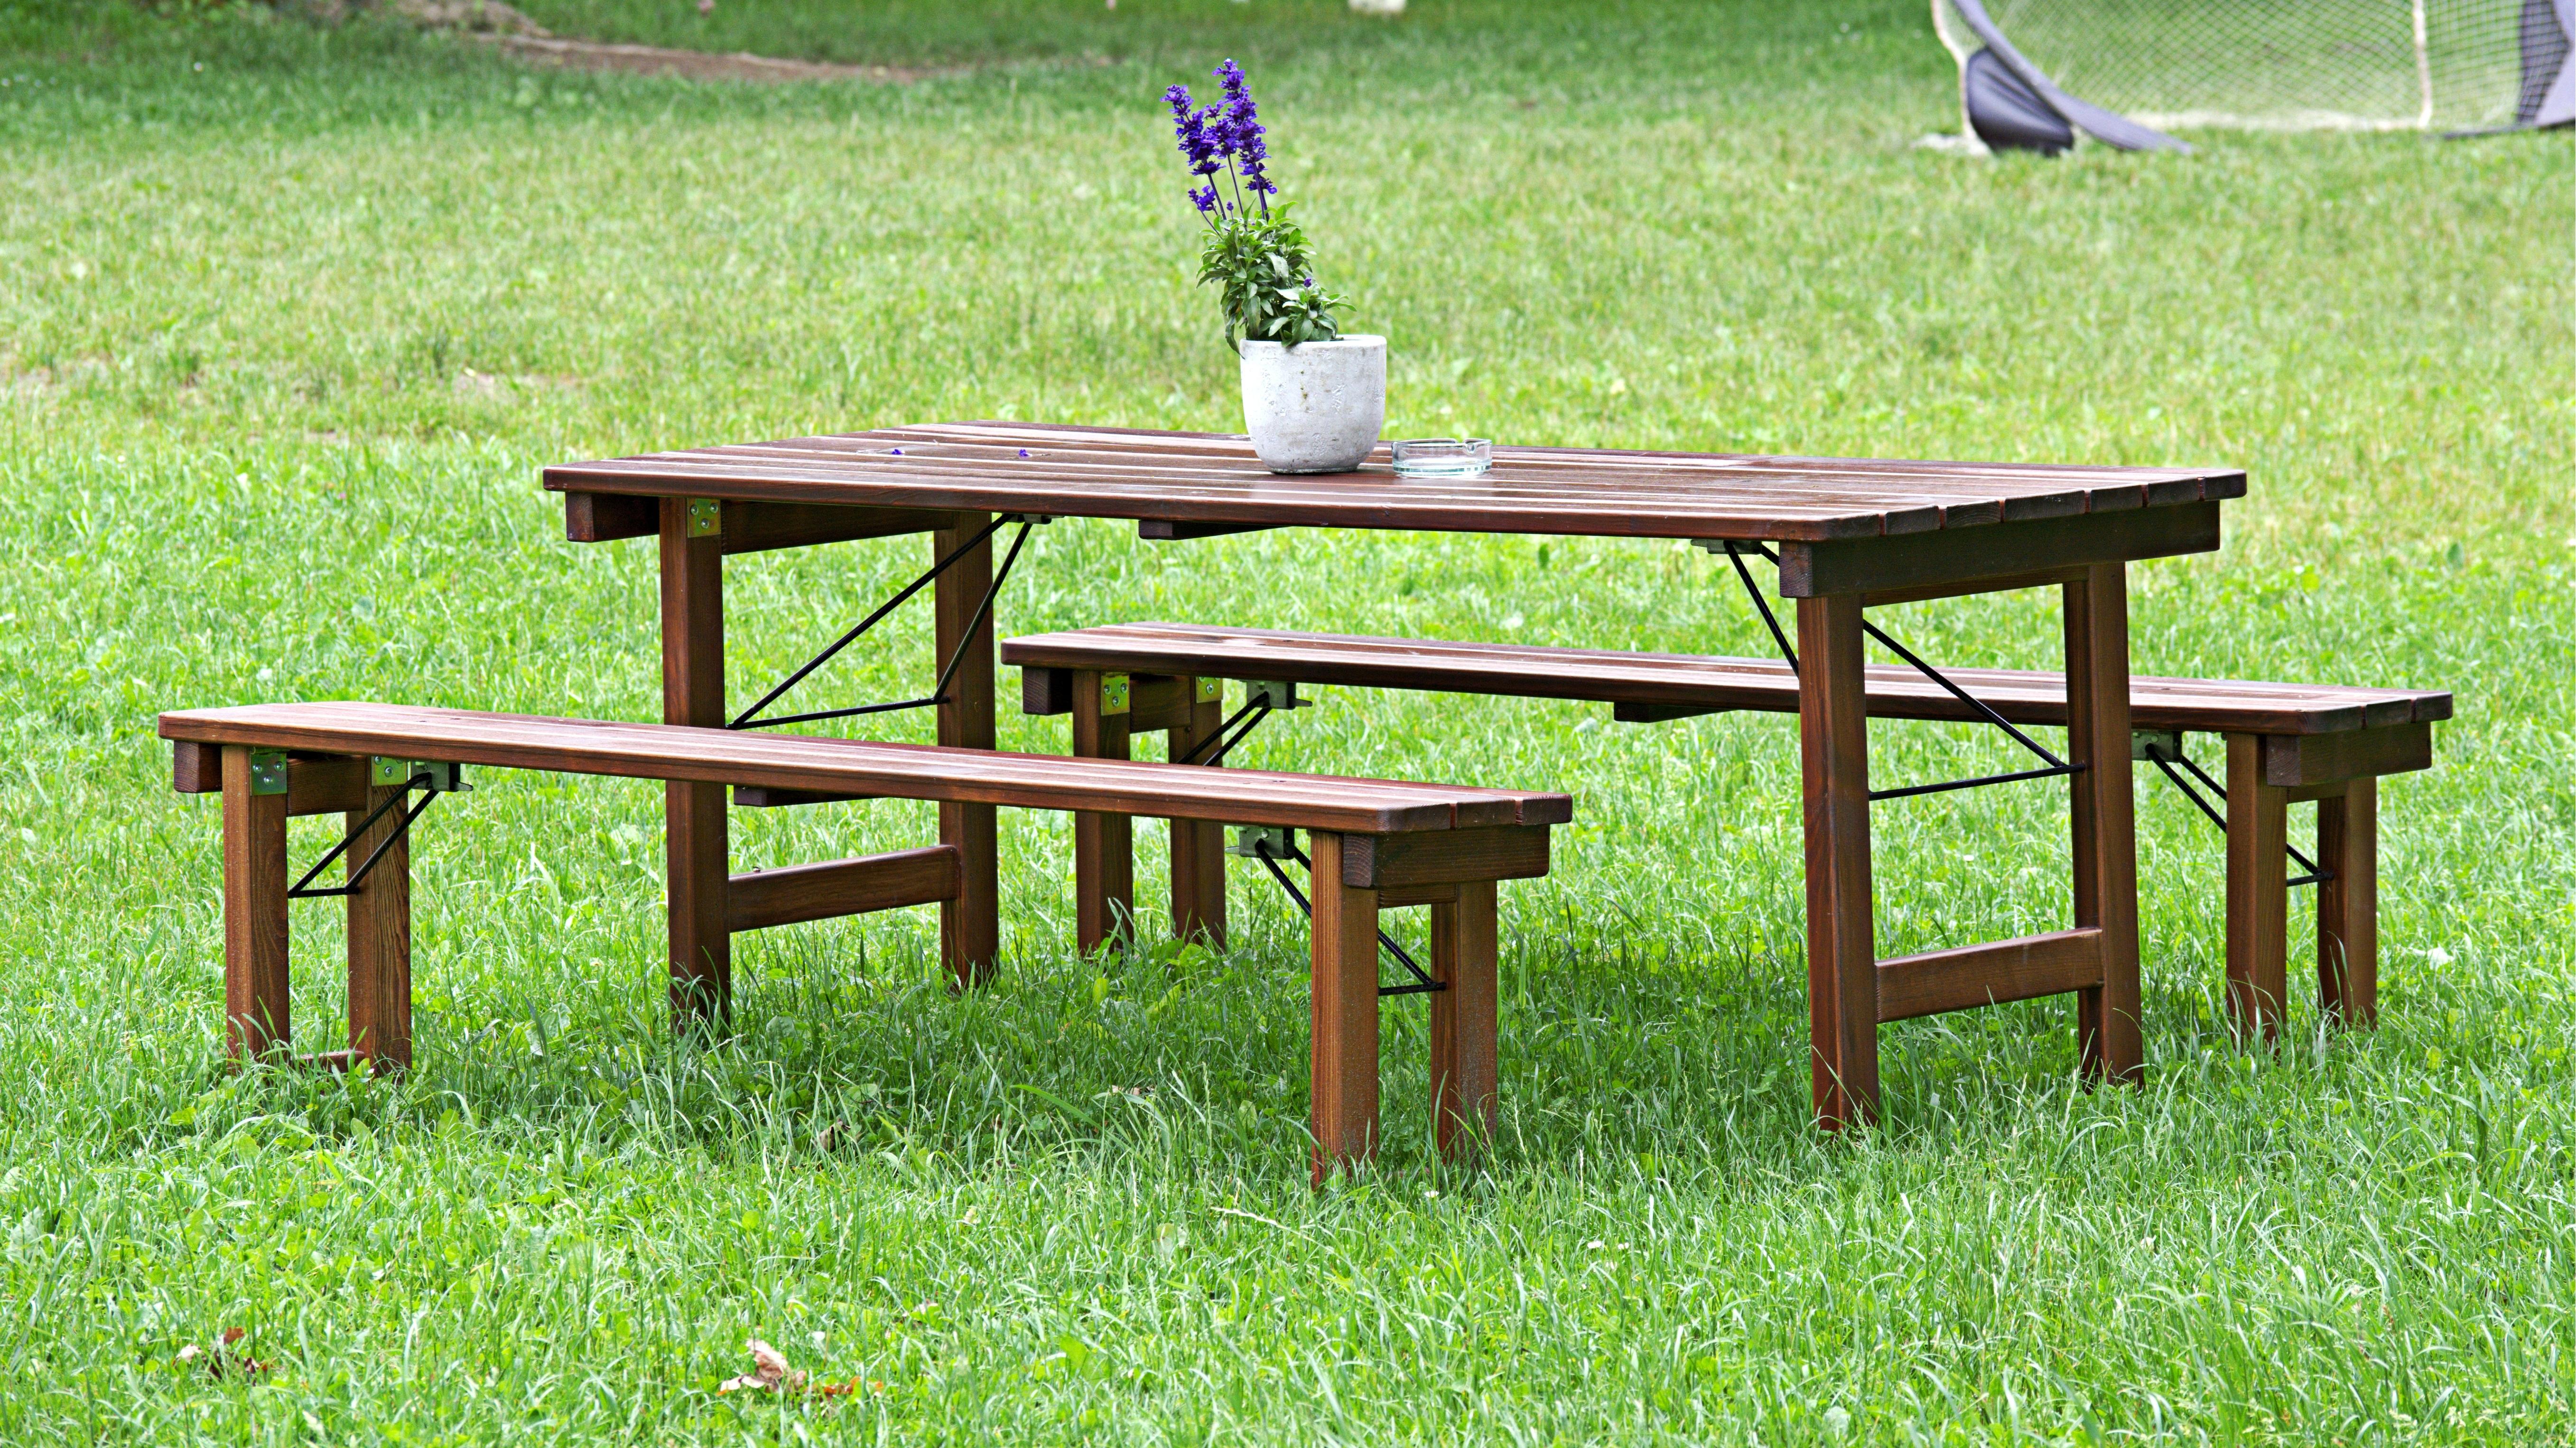 Tabelle Natur Holz Bank Sessel Sitz Rustikal Entspannen Sie Sich Sich  Ausruhen Set Möbel Holzbank Bank